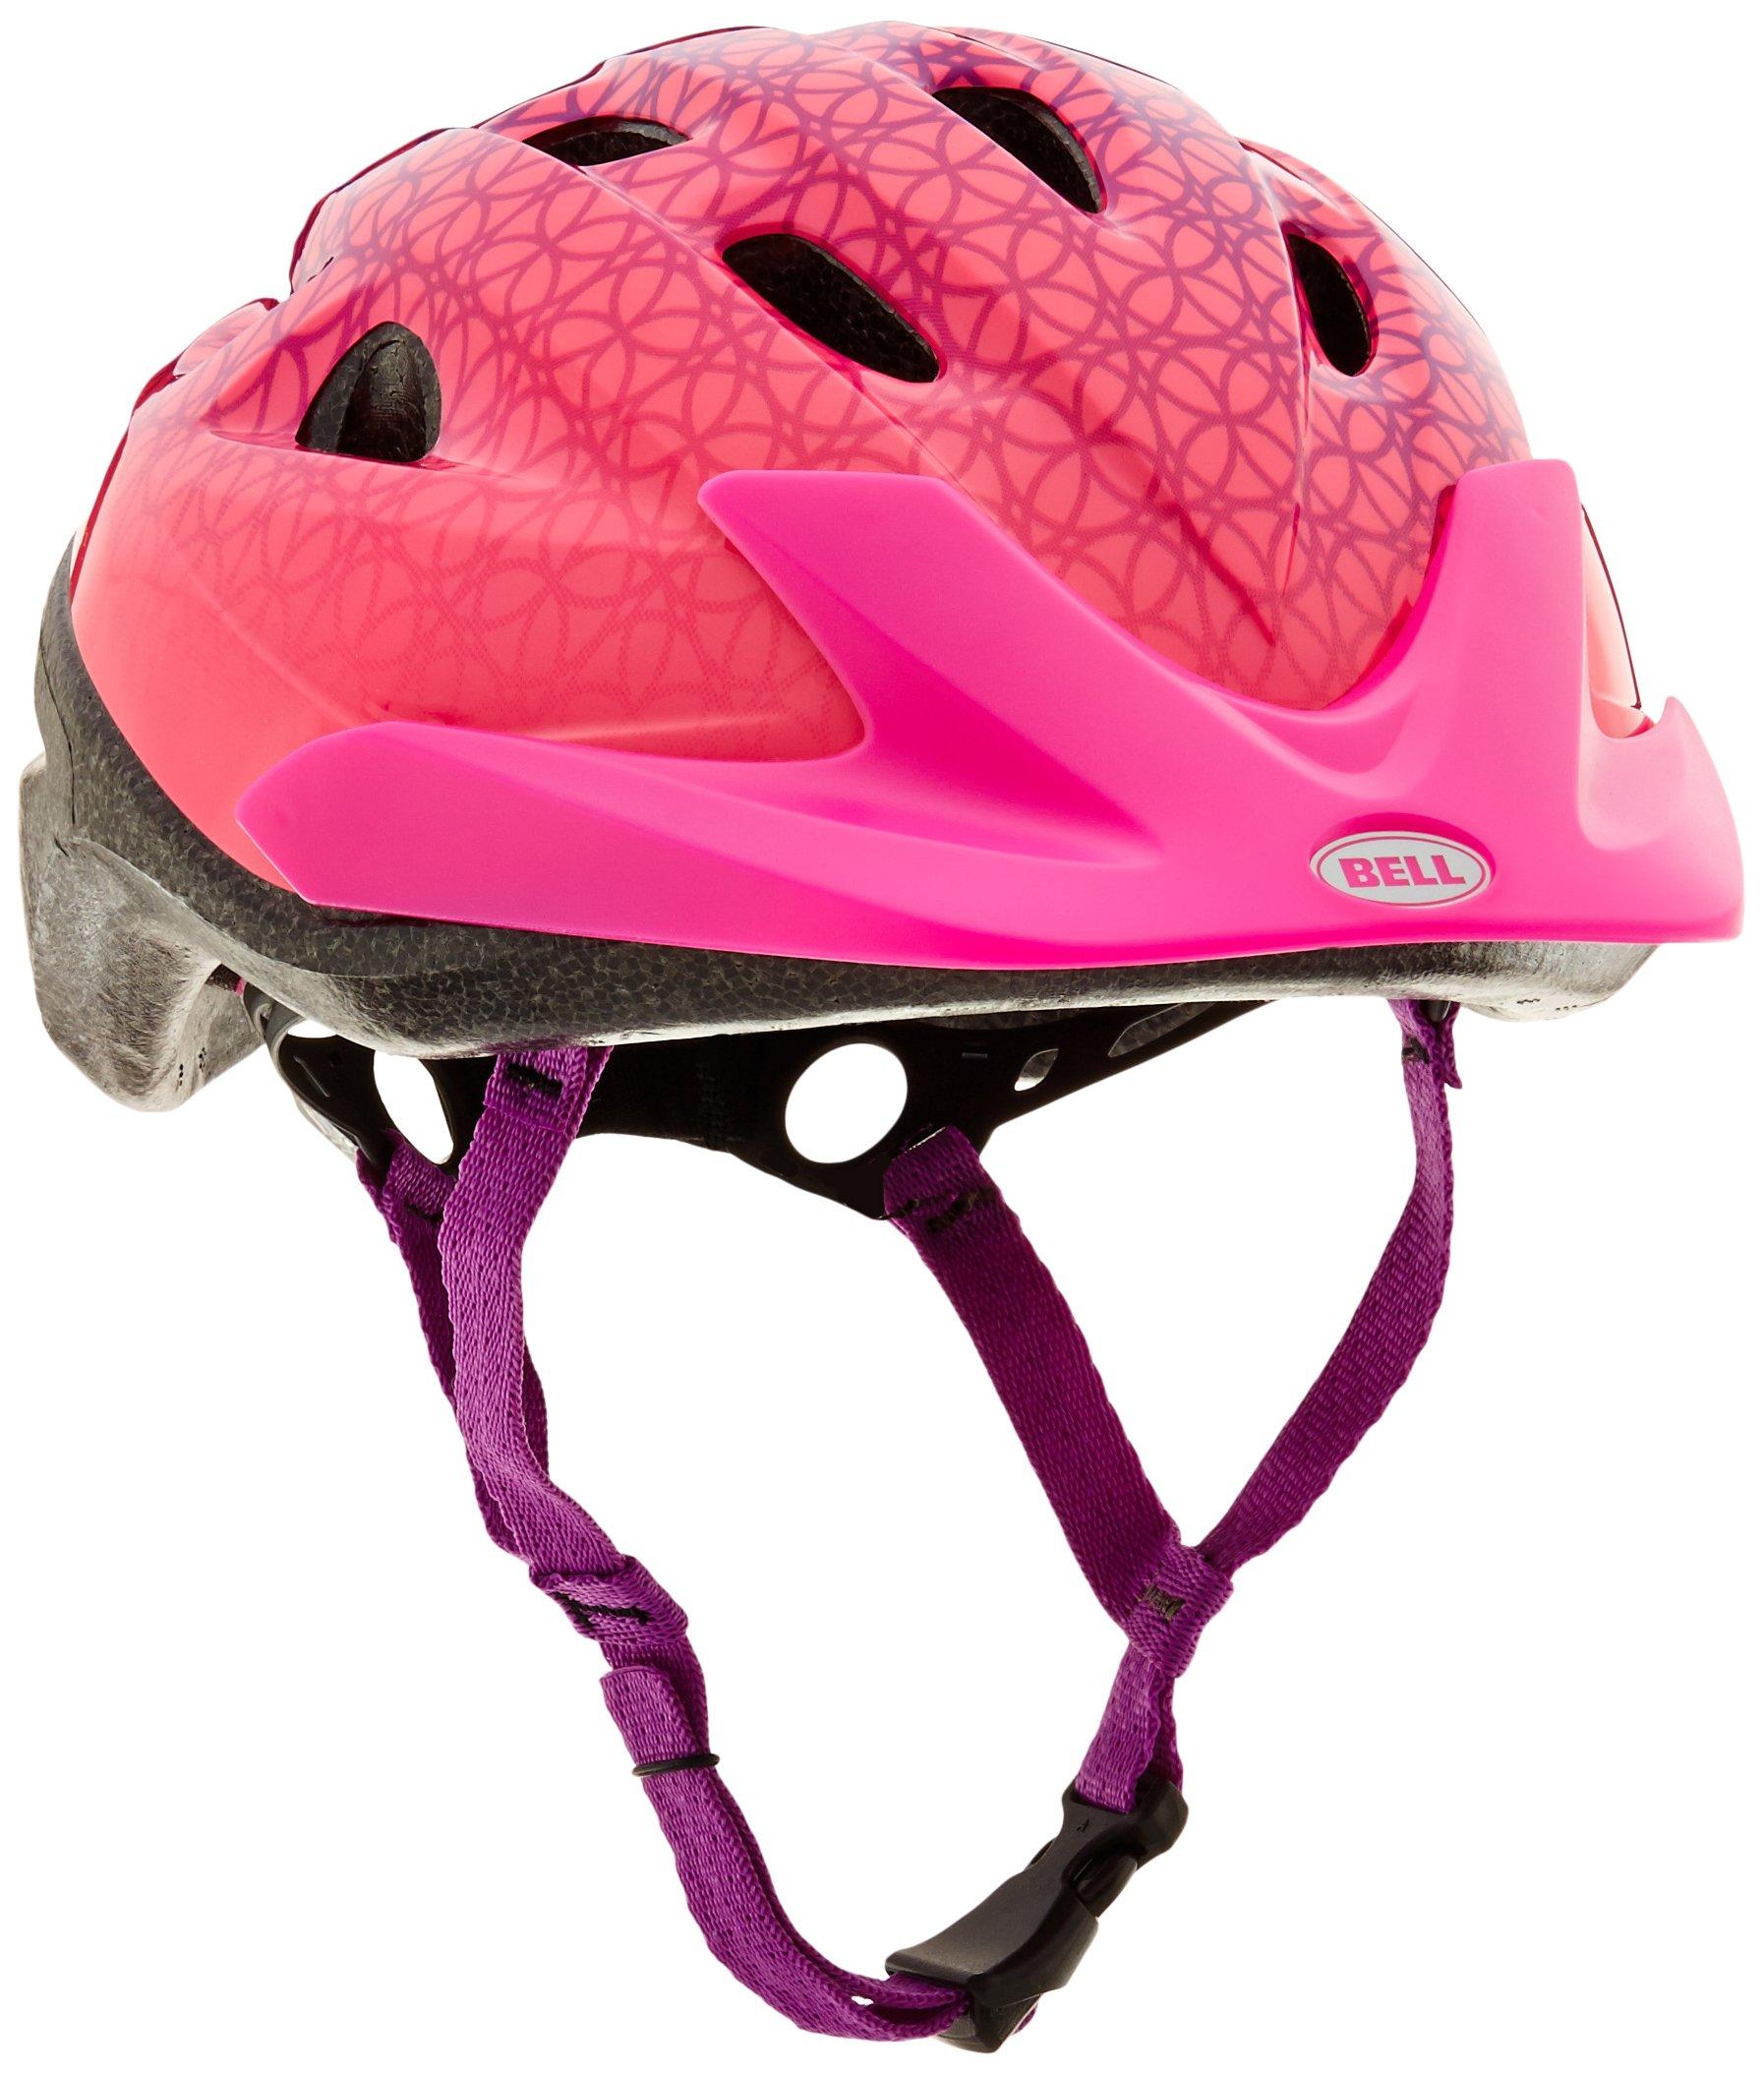 Bell 7063276 Child Pink Prismatic Rally Helmet